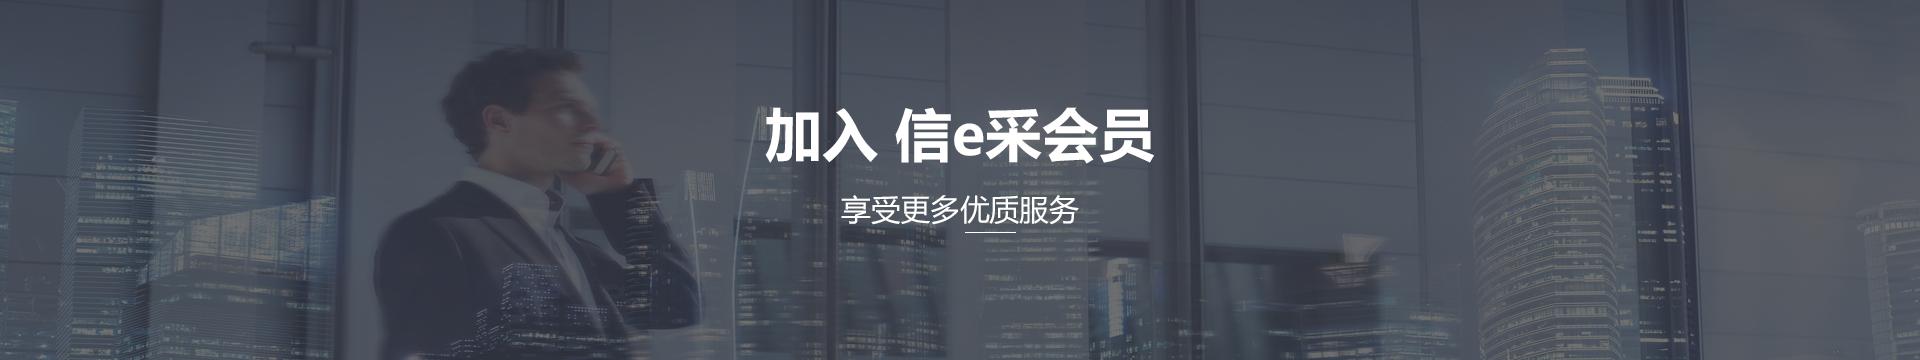 会员页面banner